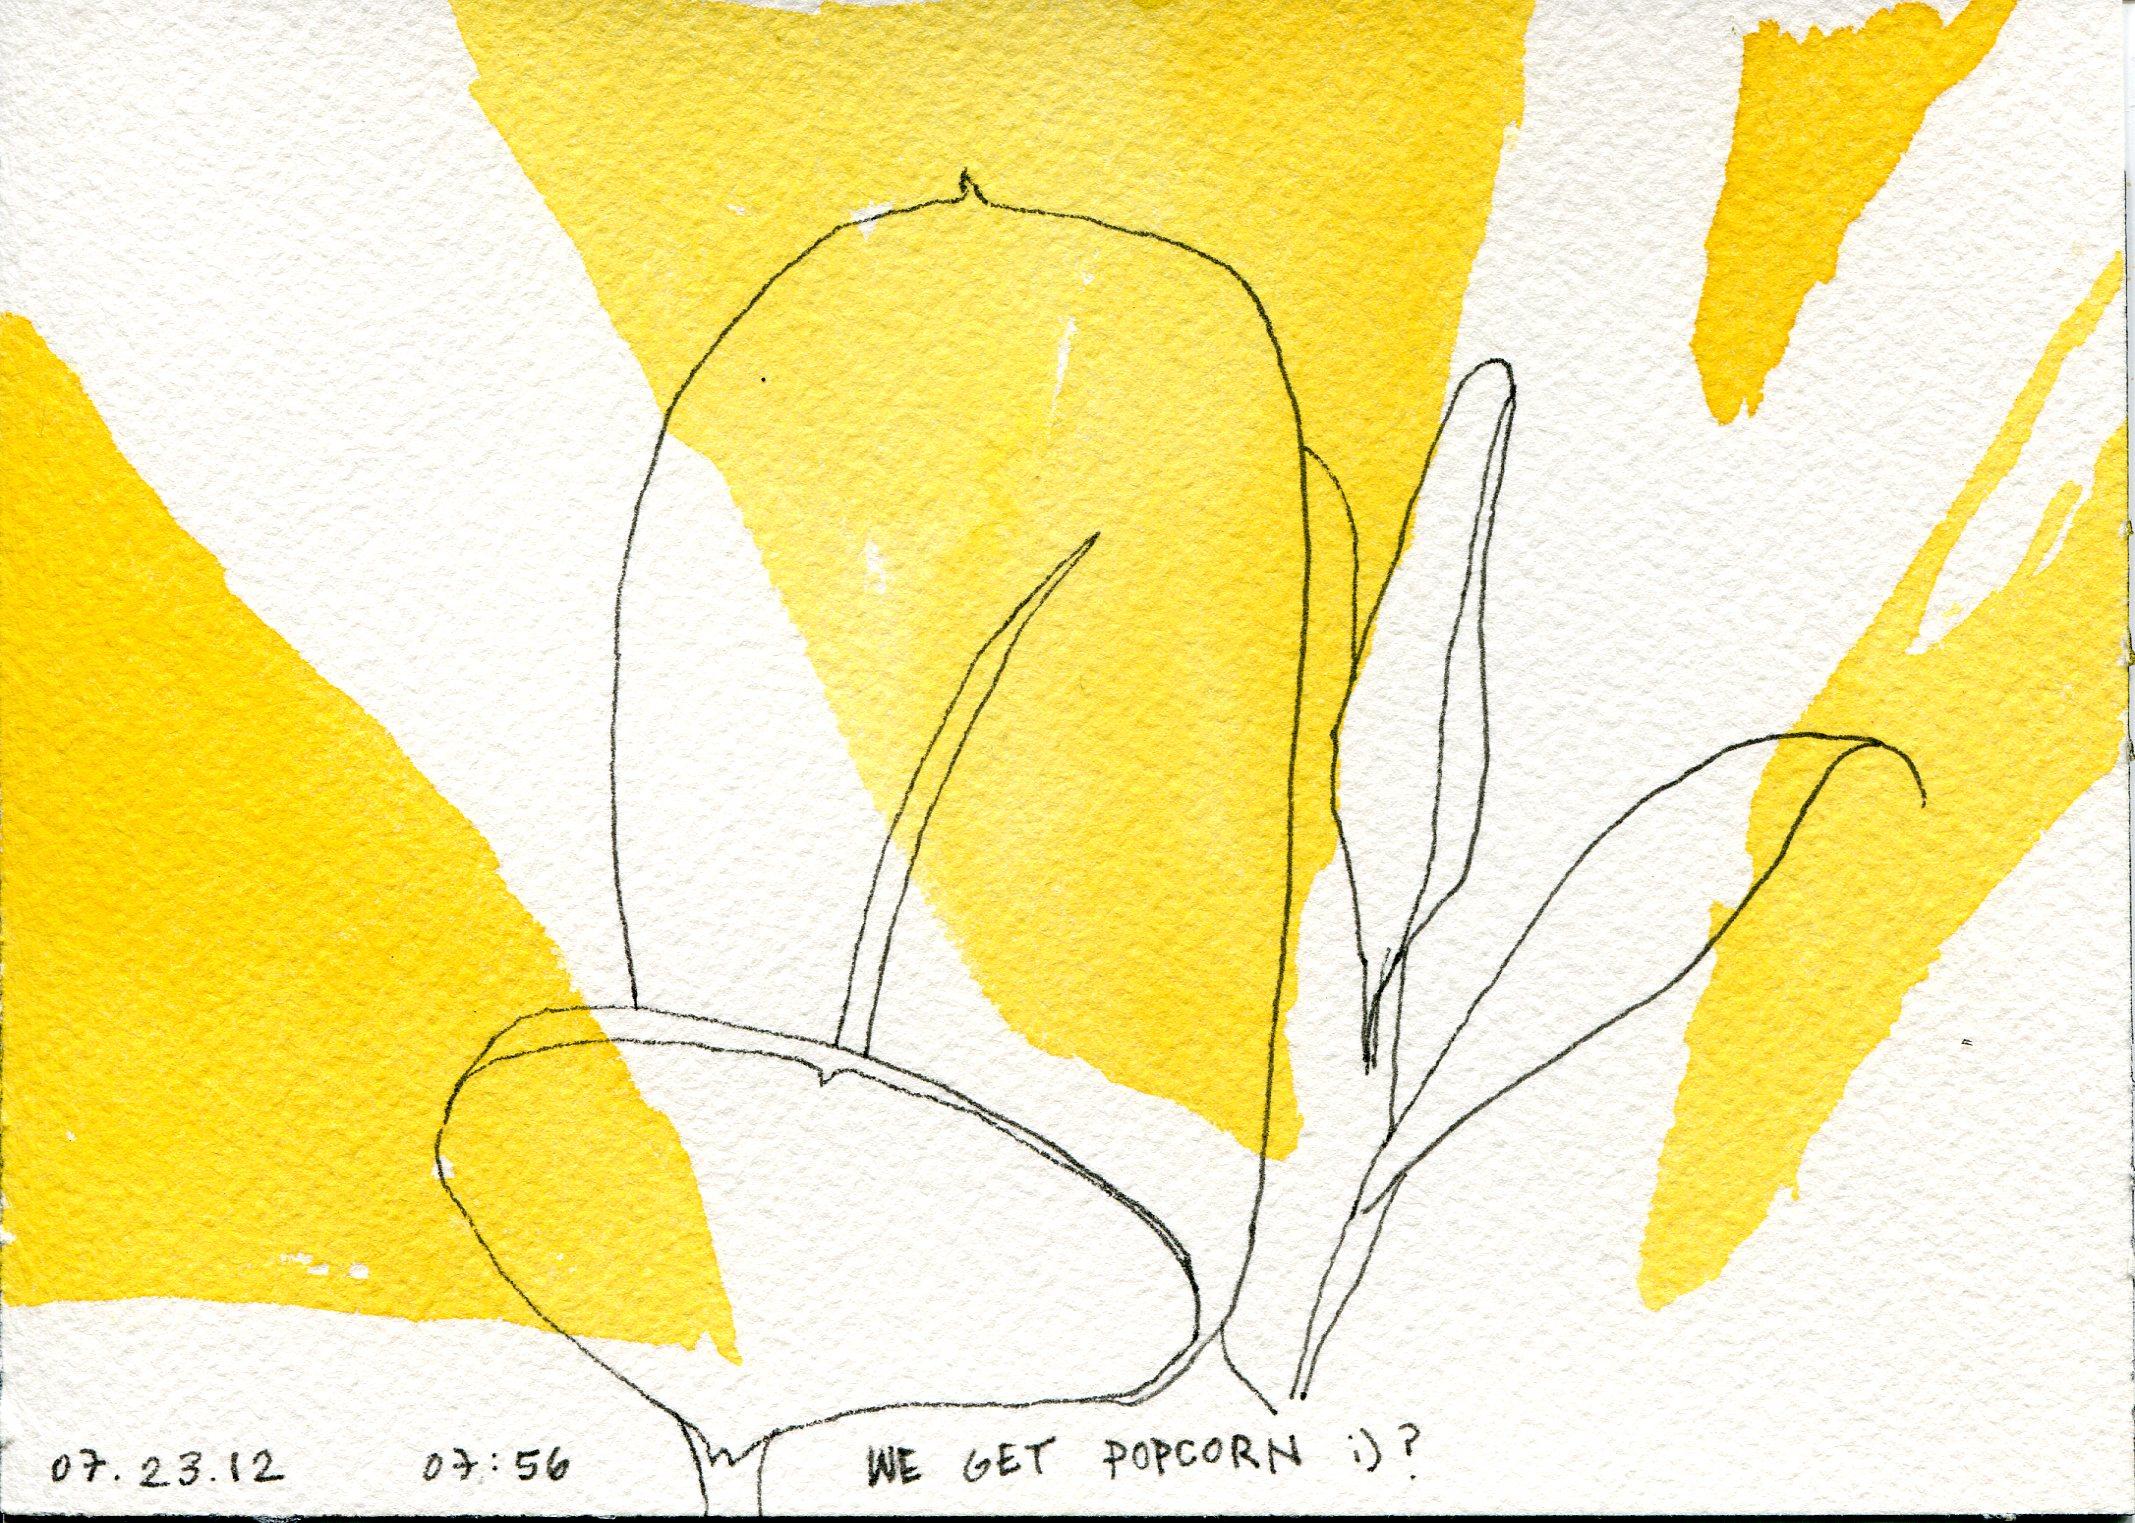 2012-07-29 drawing002.jpg